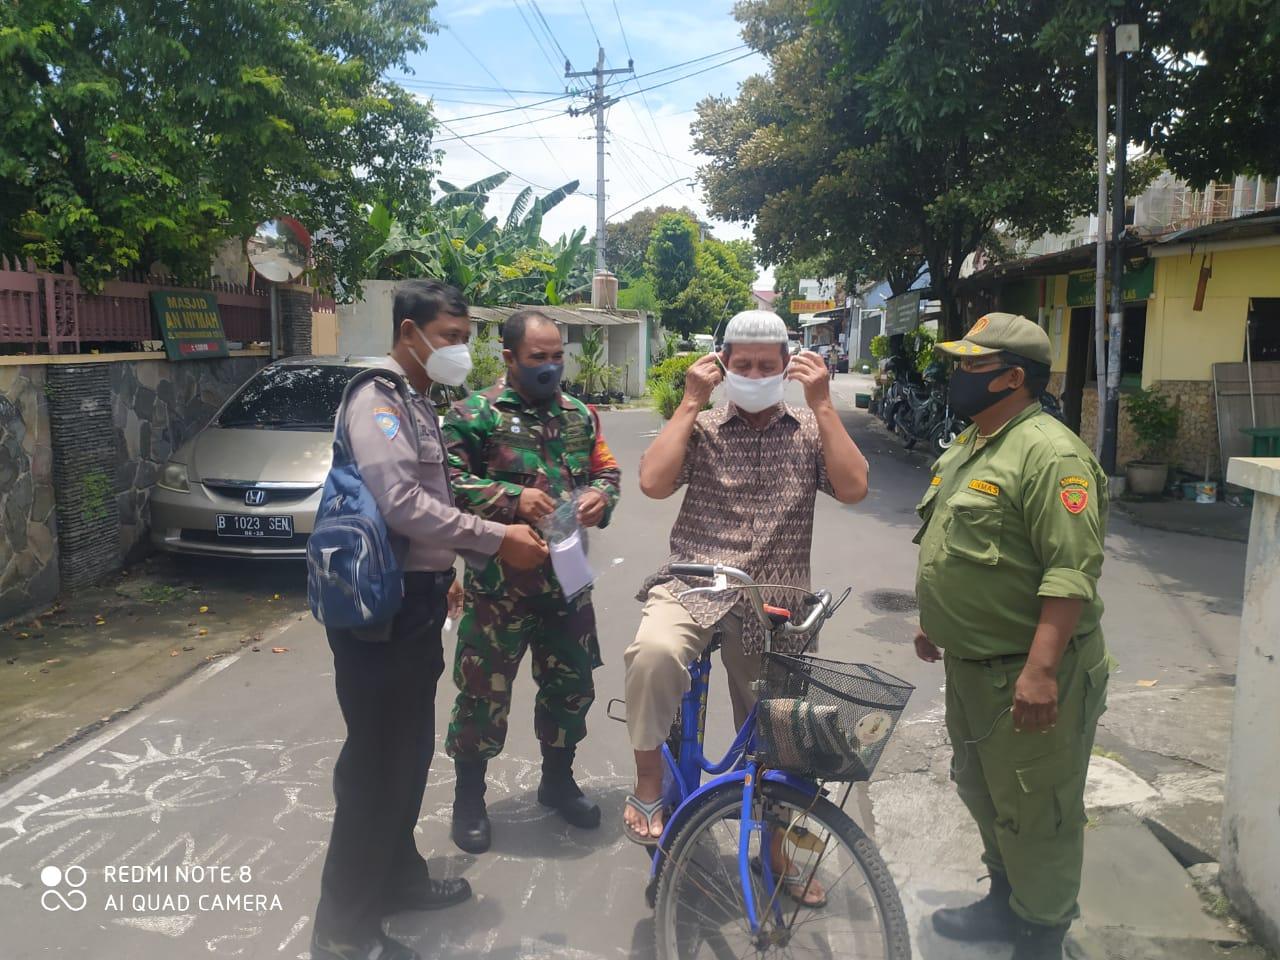 Babinsa dan Bhabinkamtibmas Kemlayan Susuri Jalan Kampung Sambil Sosialisasikan PPKM dan Bagikan Masker